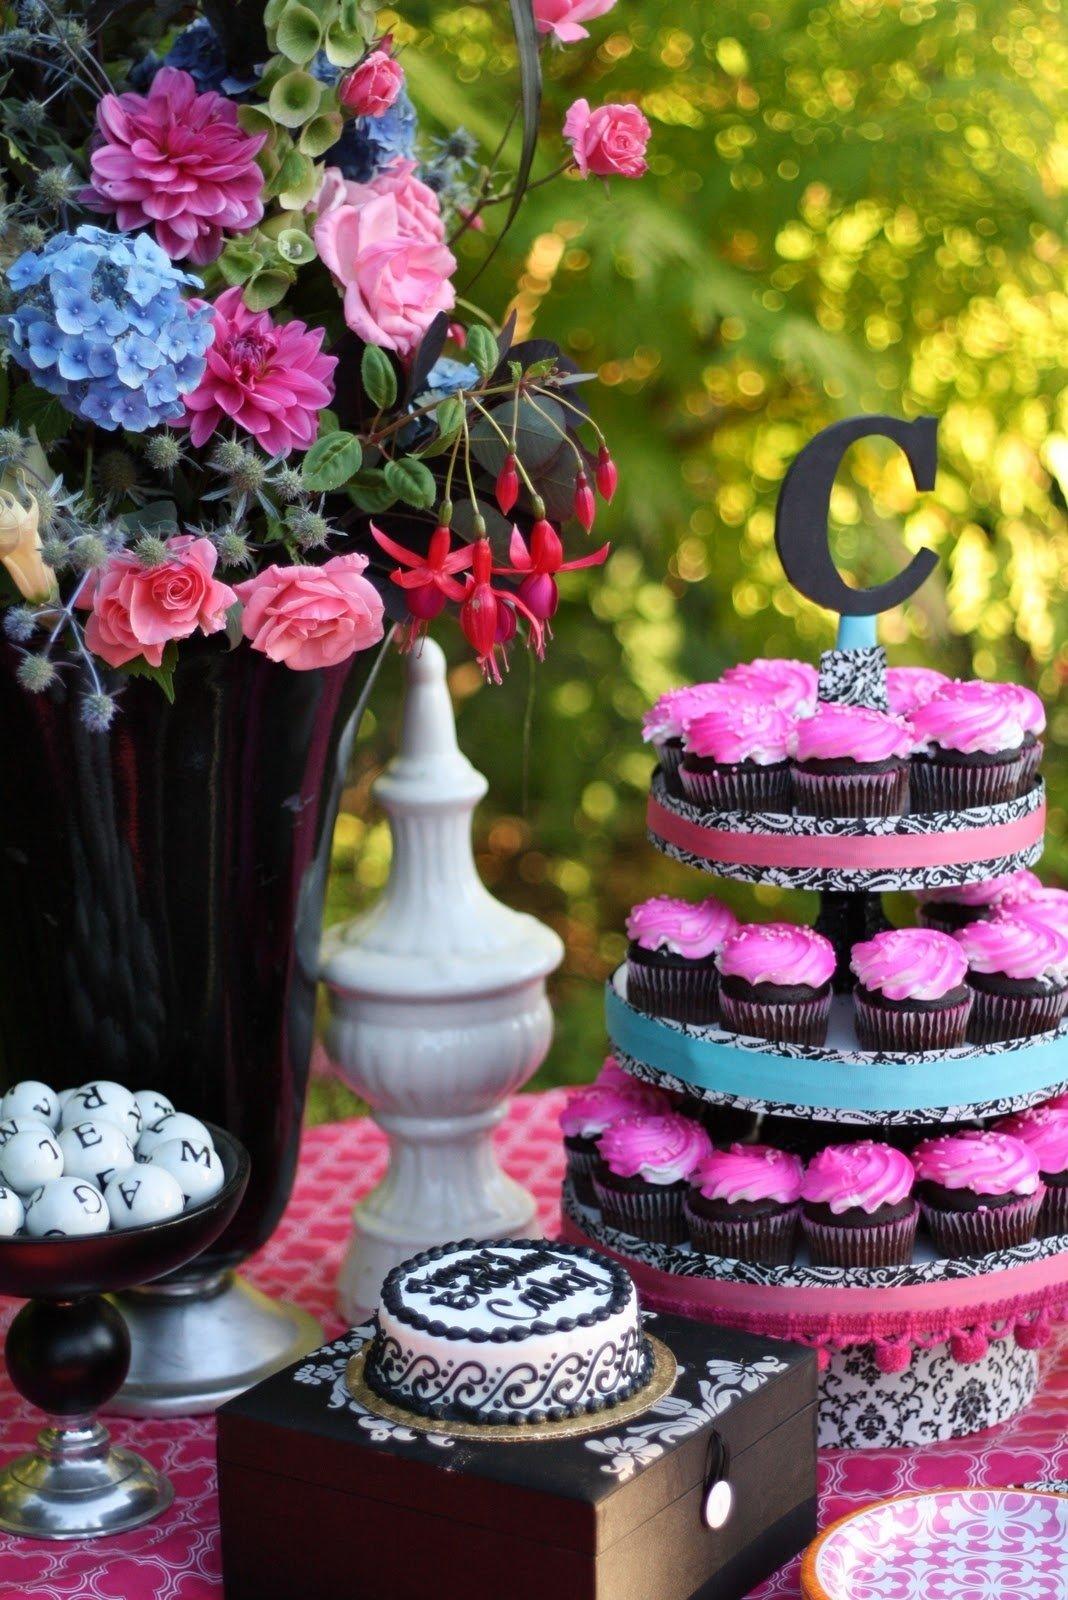 10 Most Popular Birthday Party Ideas Richmond Va birthday party ideas birthday party ideas teenage girl 4 2021